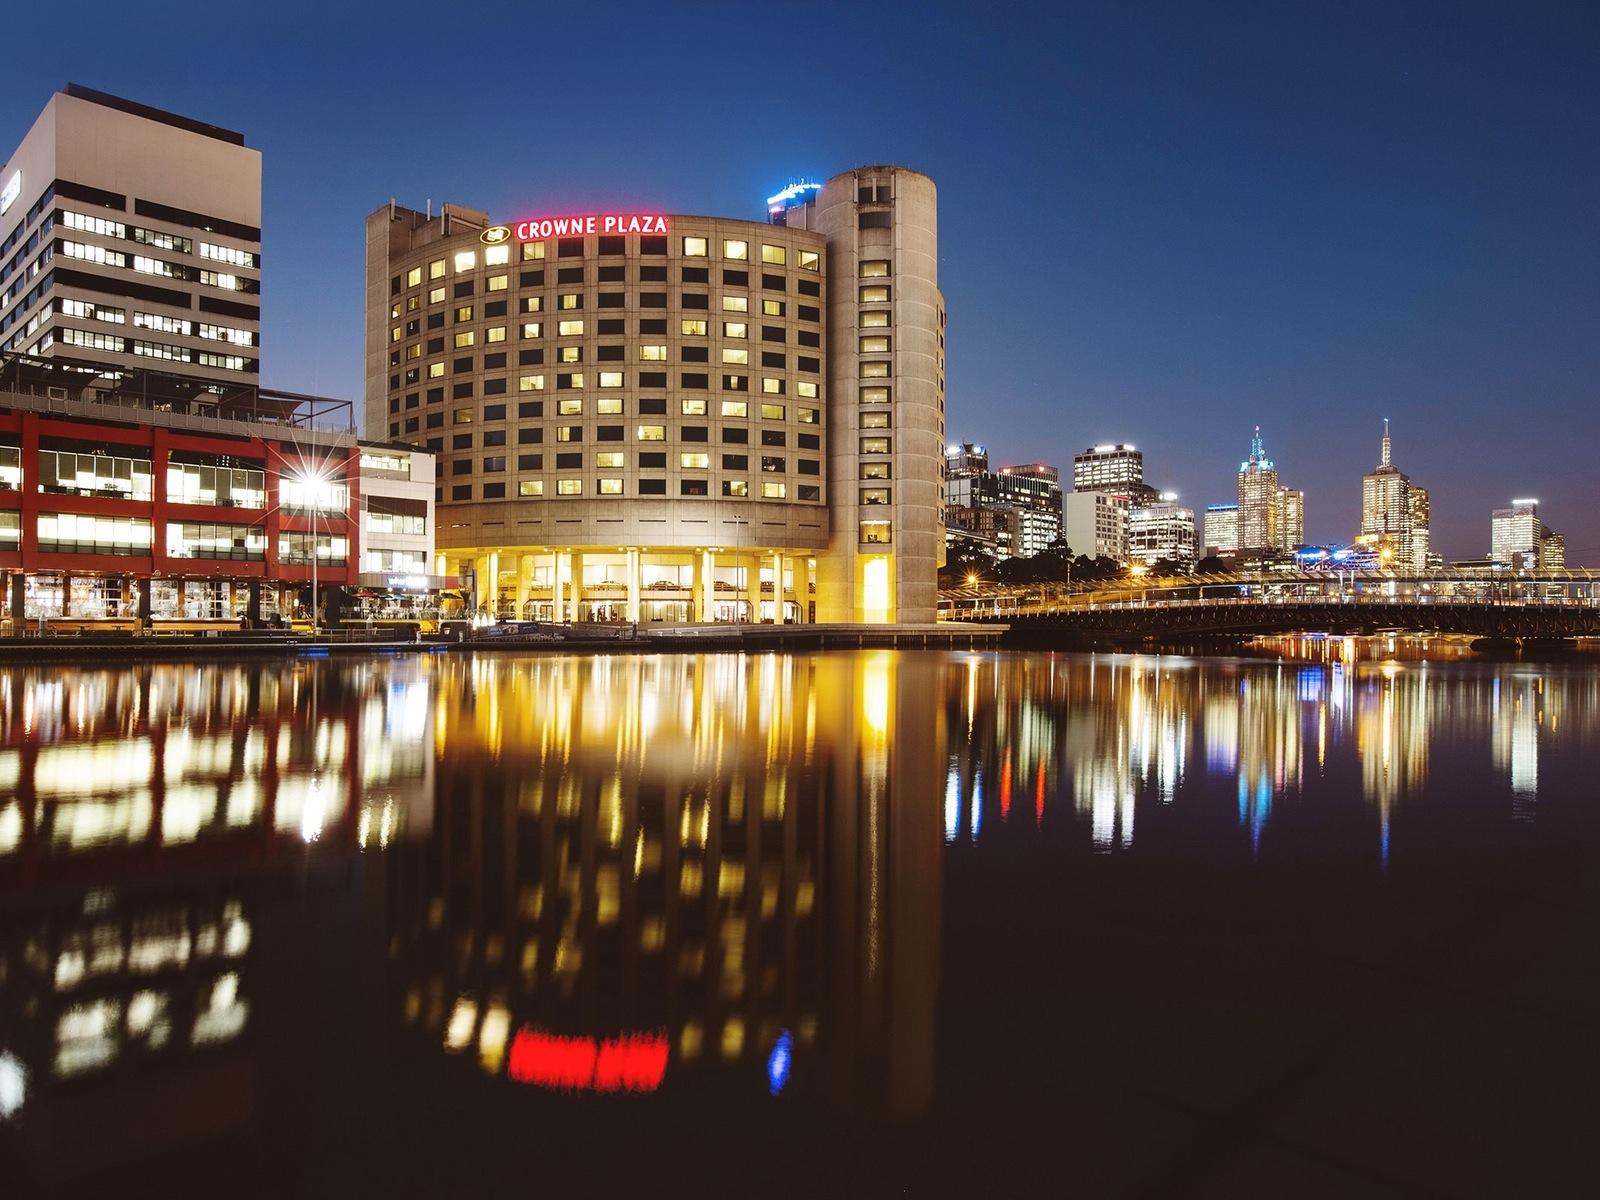 Crowne Plaza Melbourne Hotel